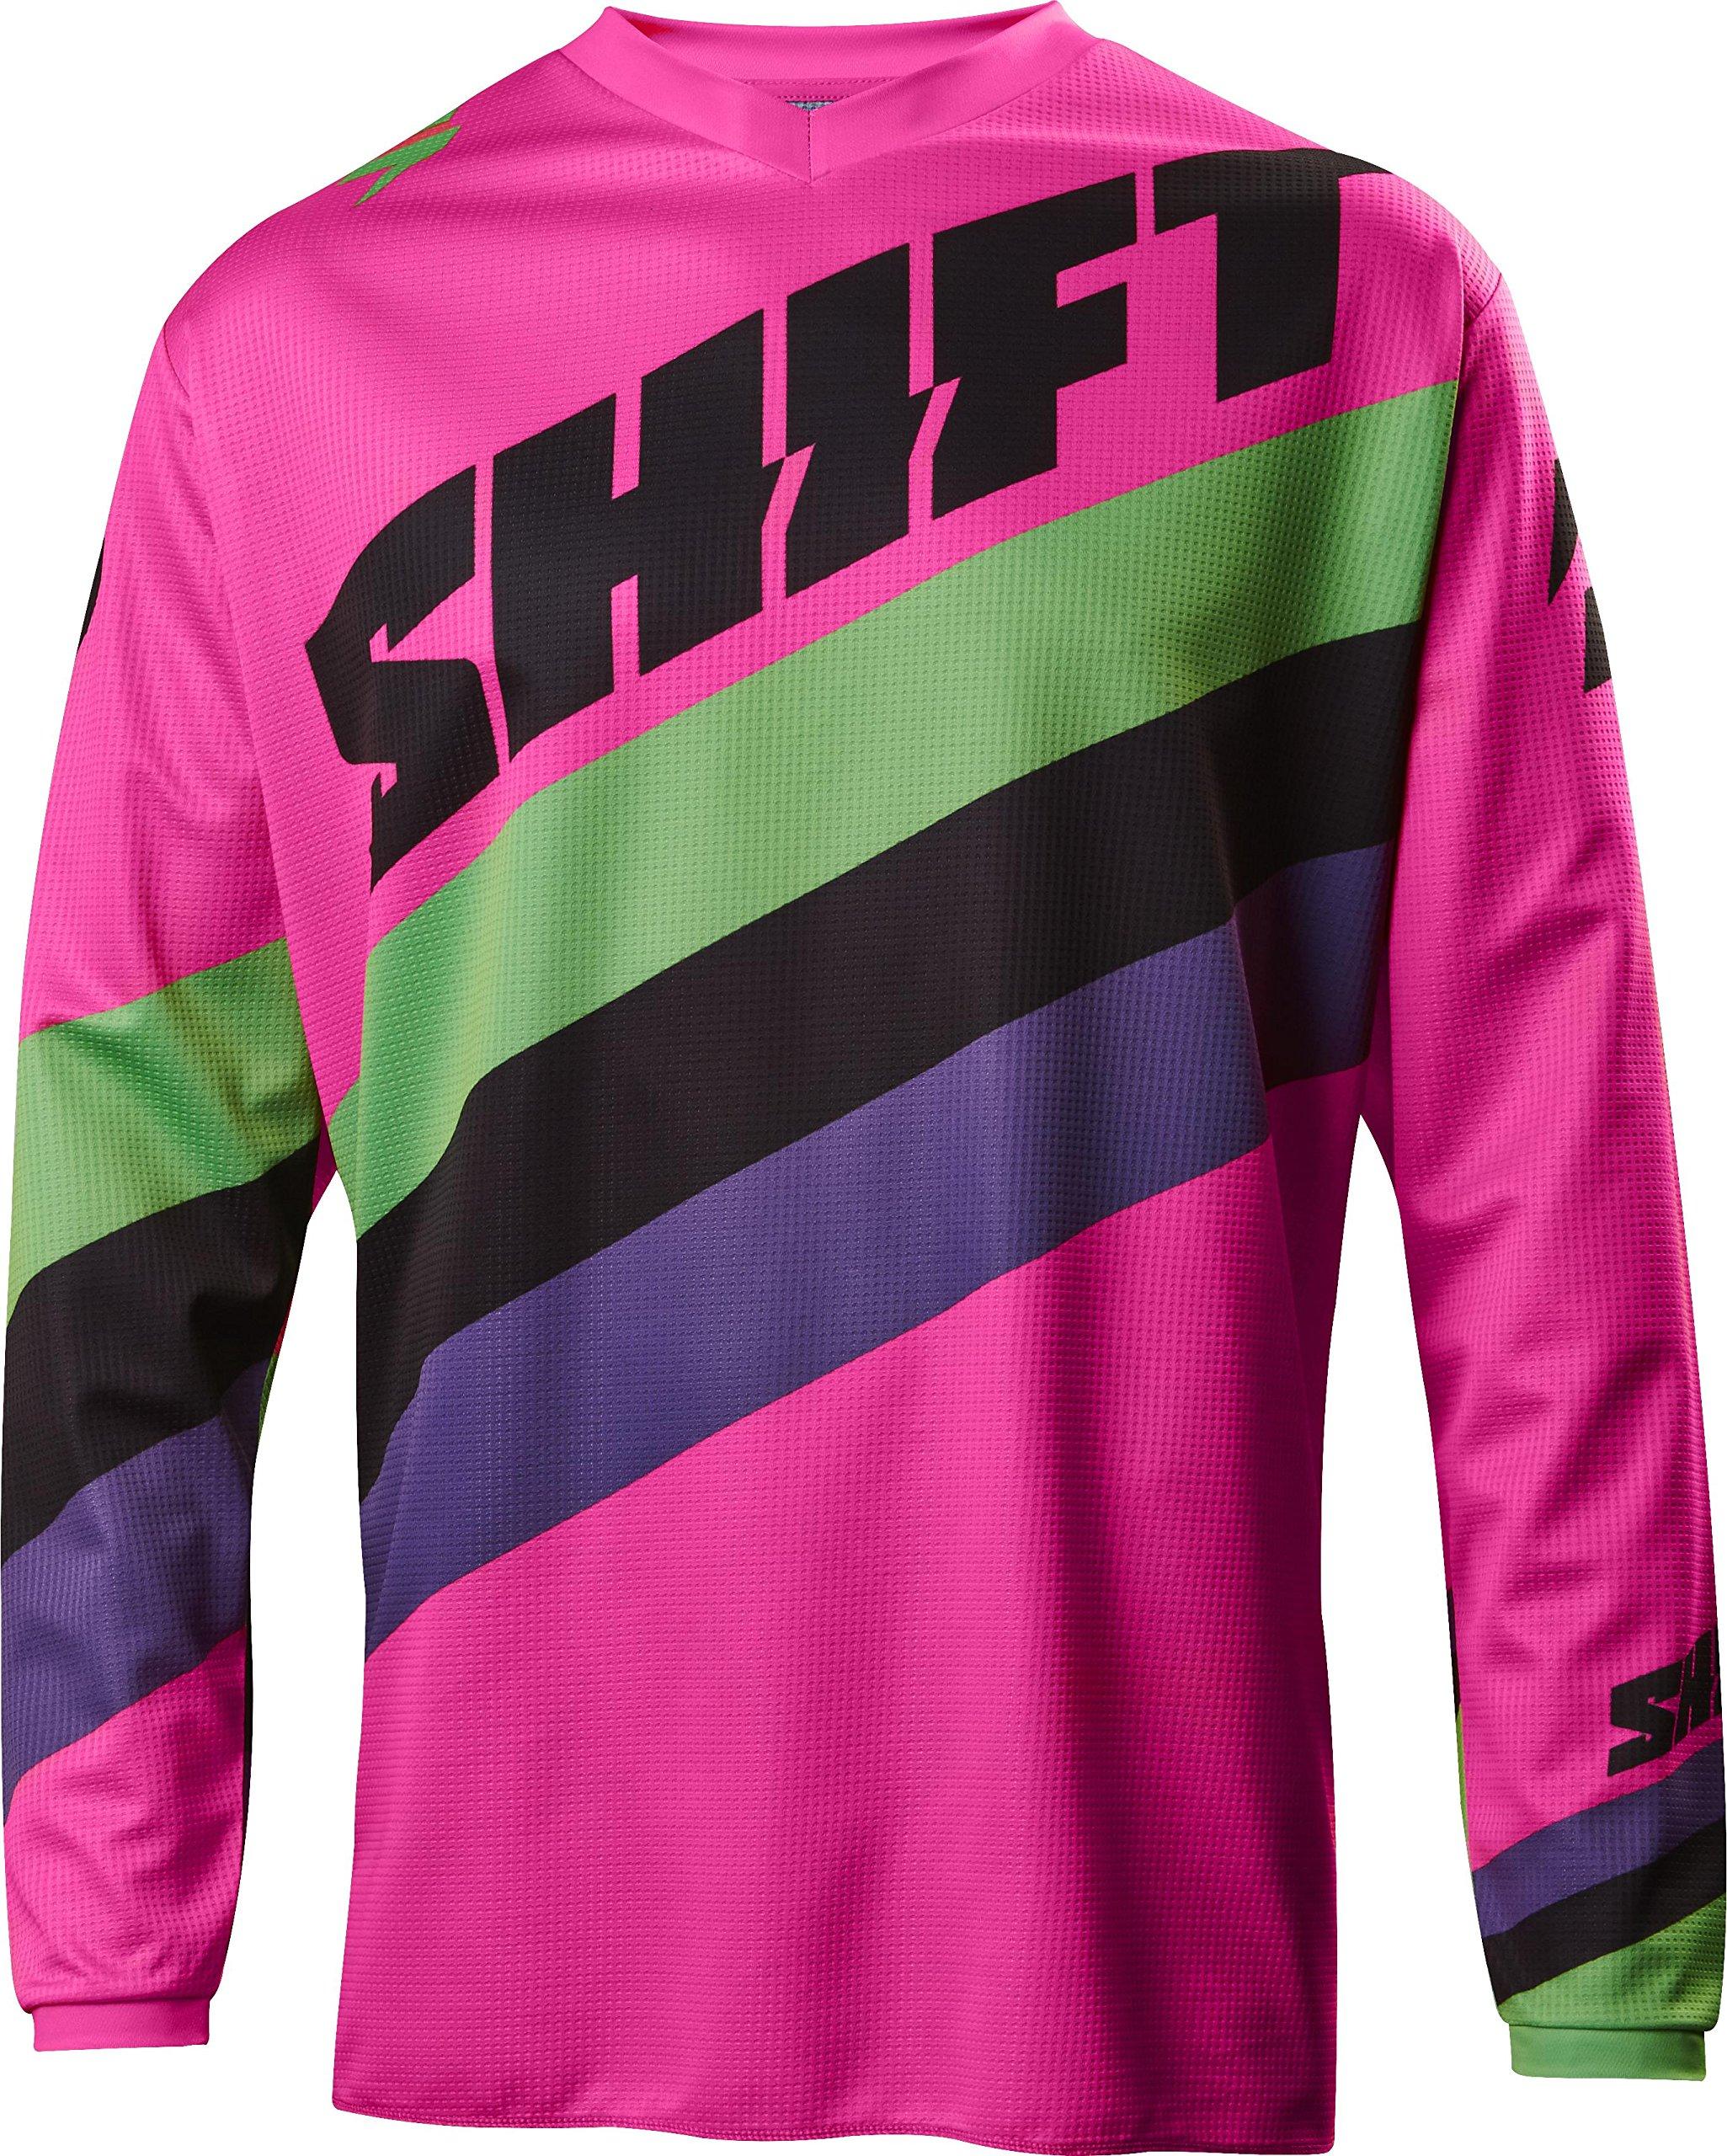 Shift 2017 White Label Tarmac Jersey-Black/Pink-M